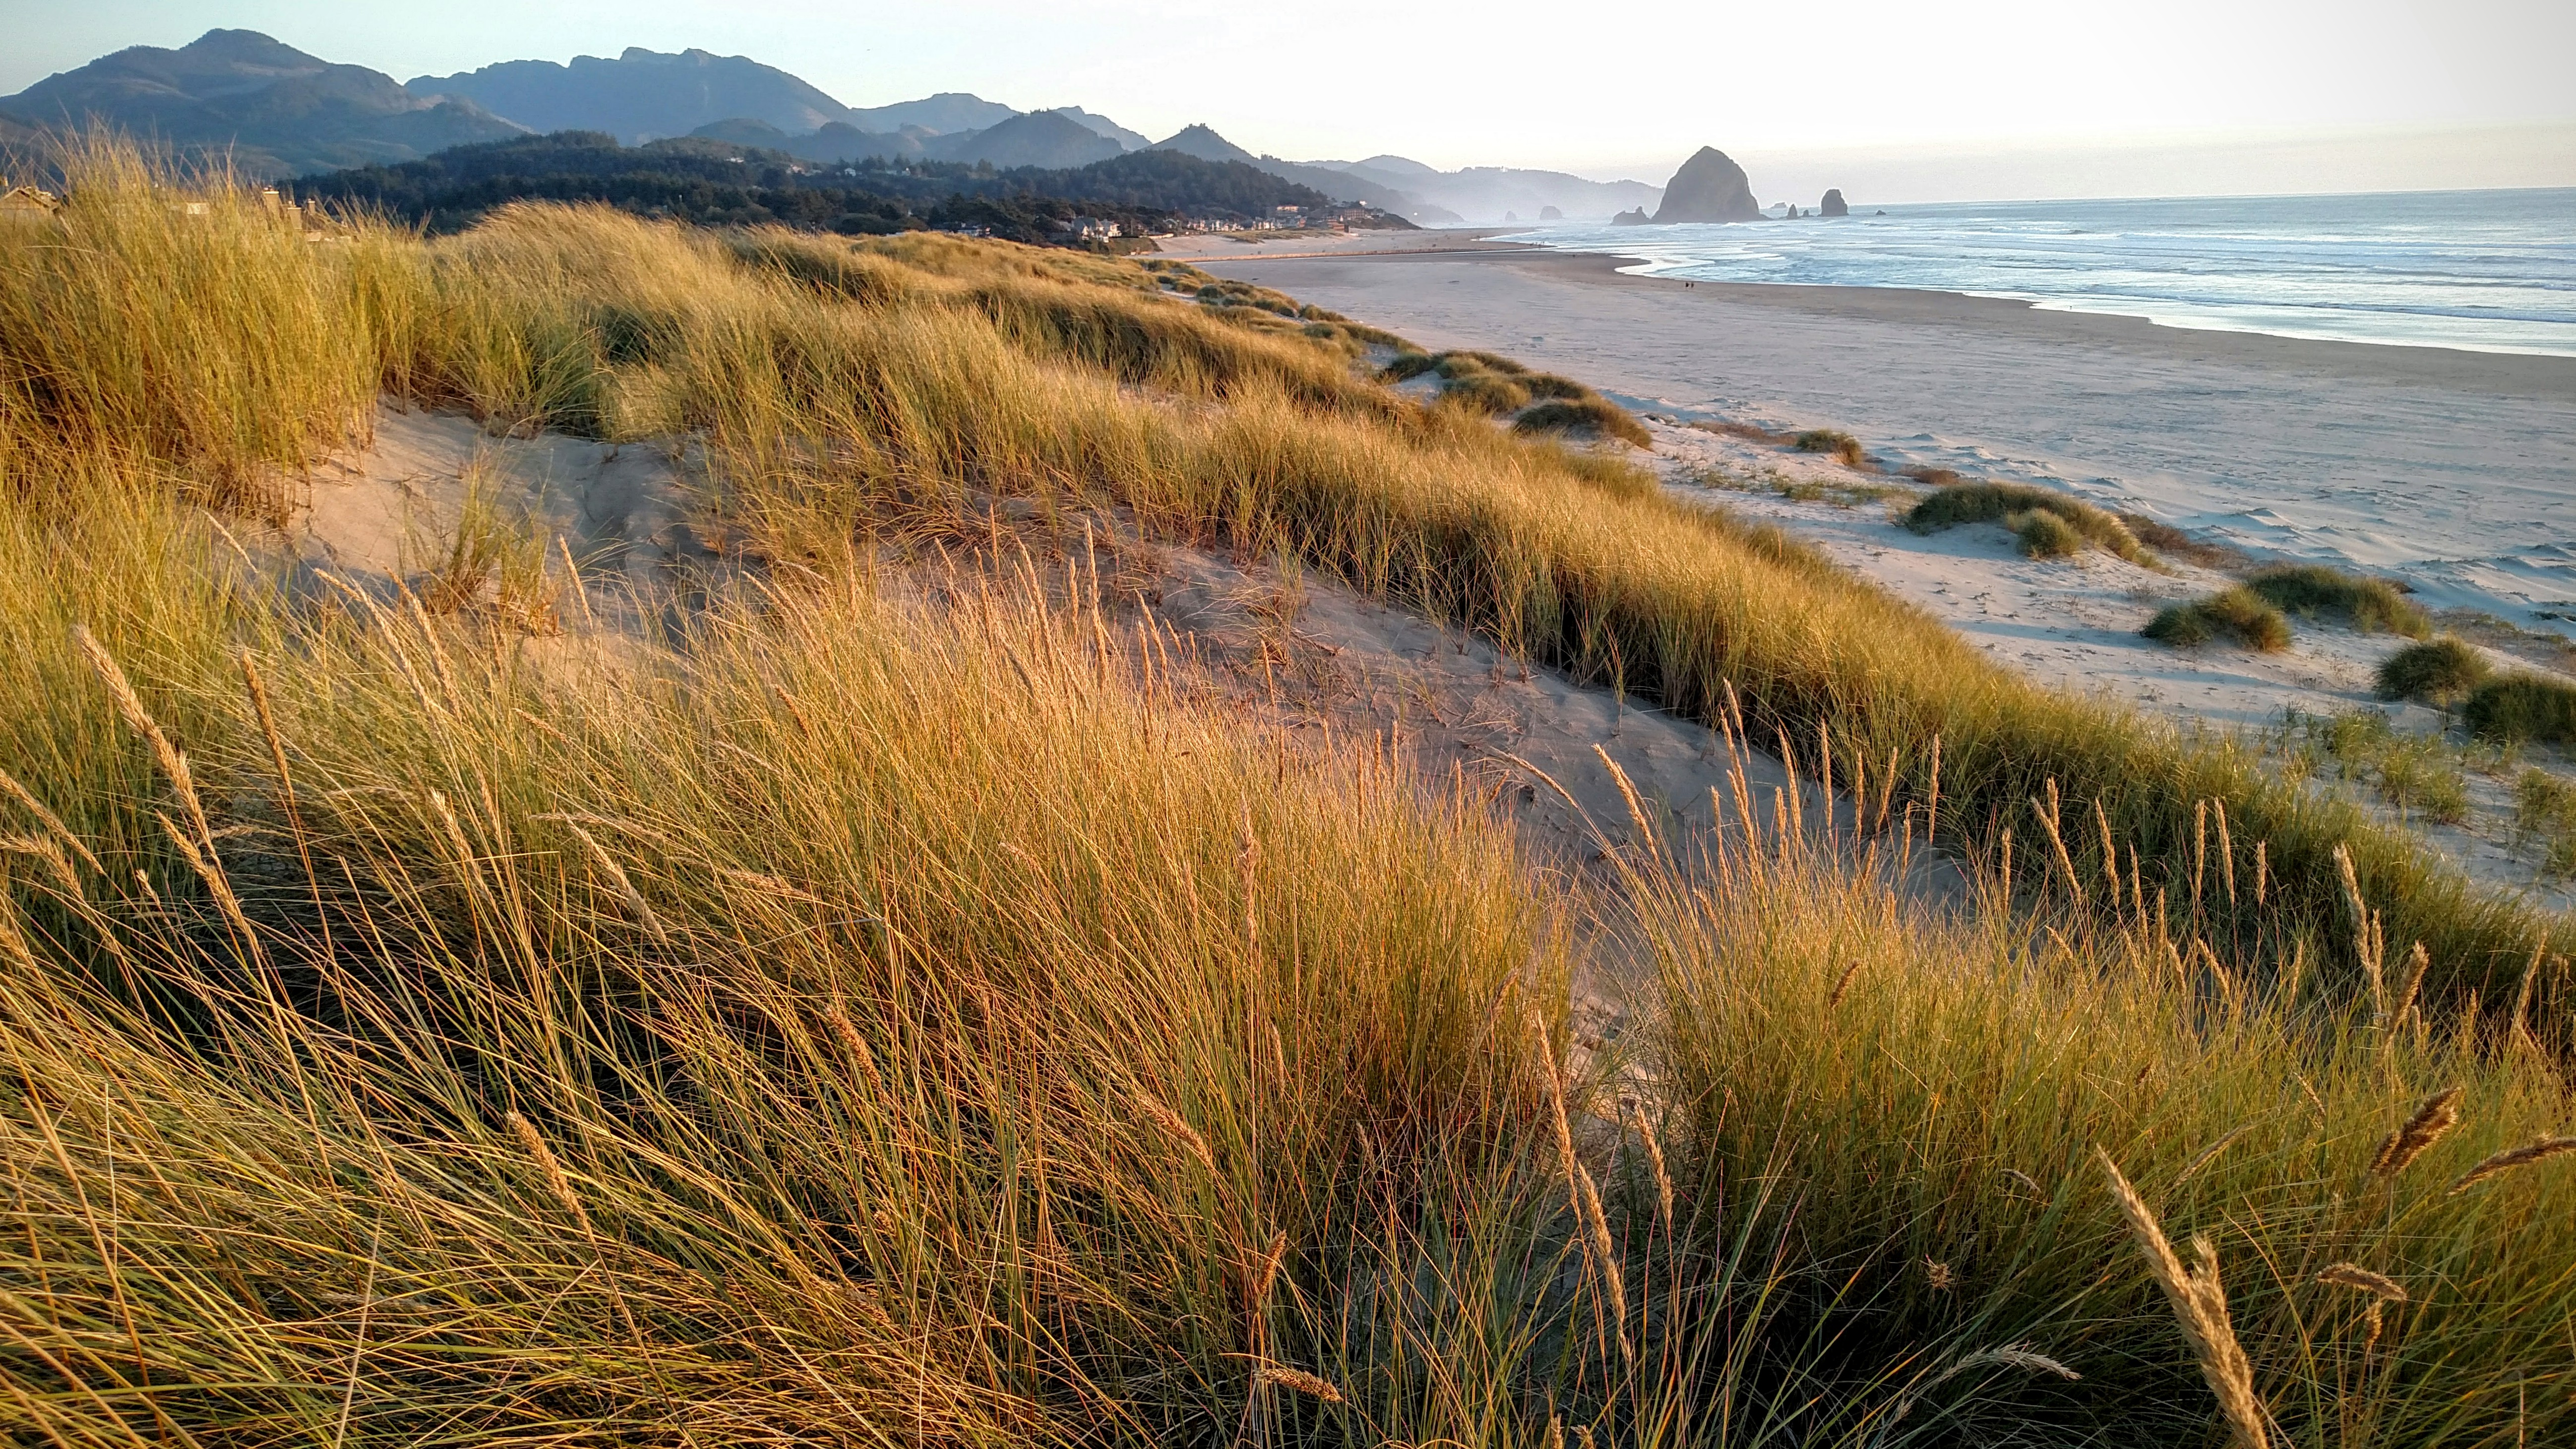 Chapman Point Sand Dunes